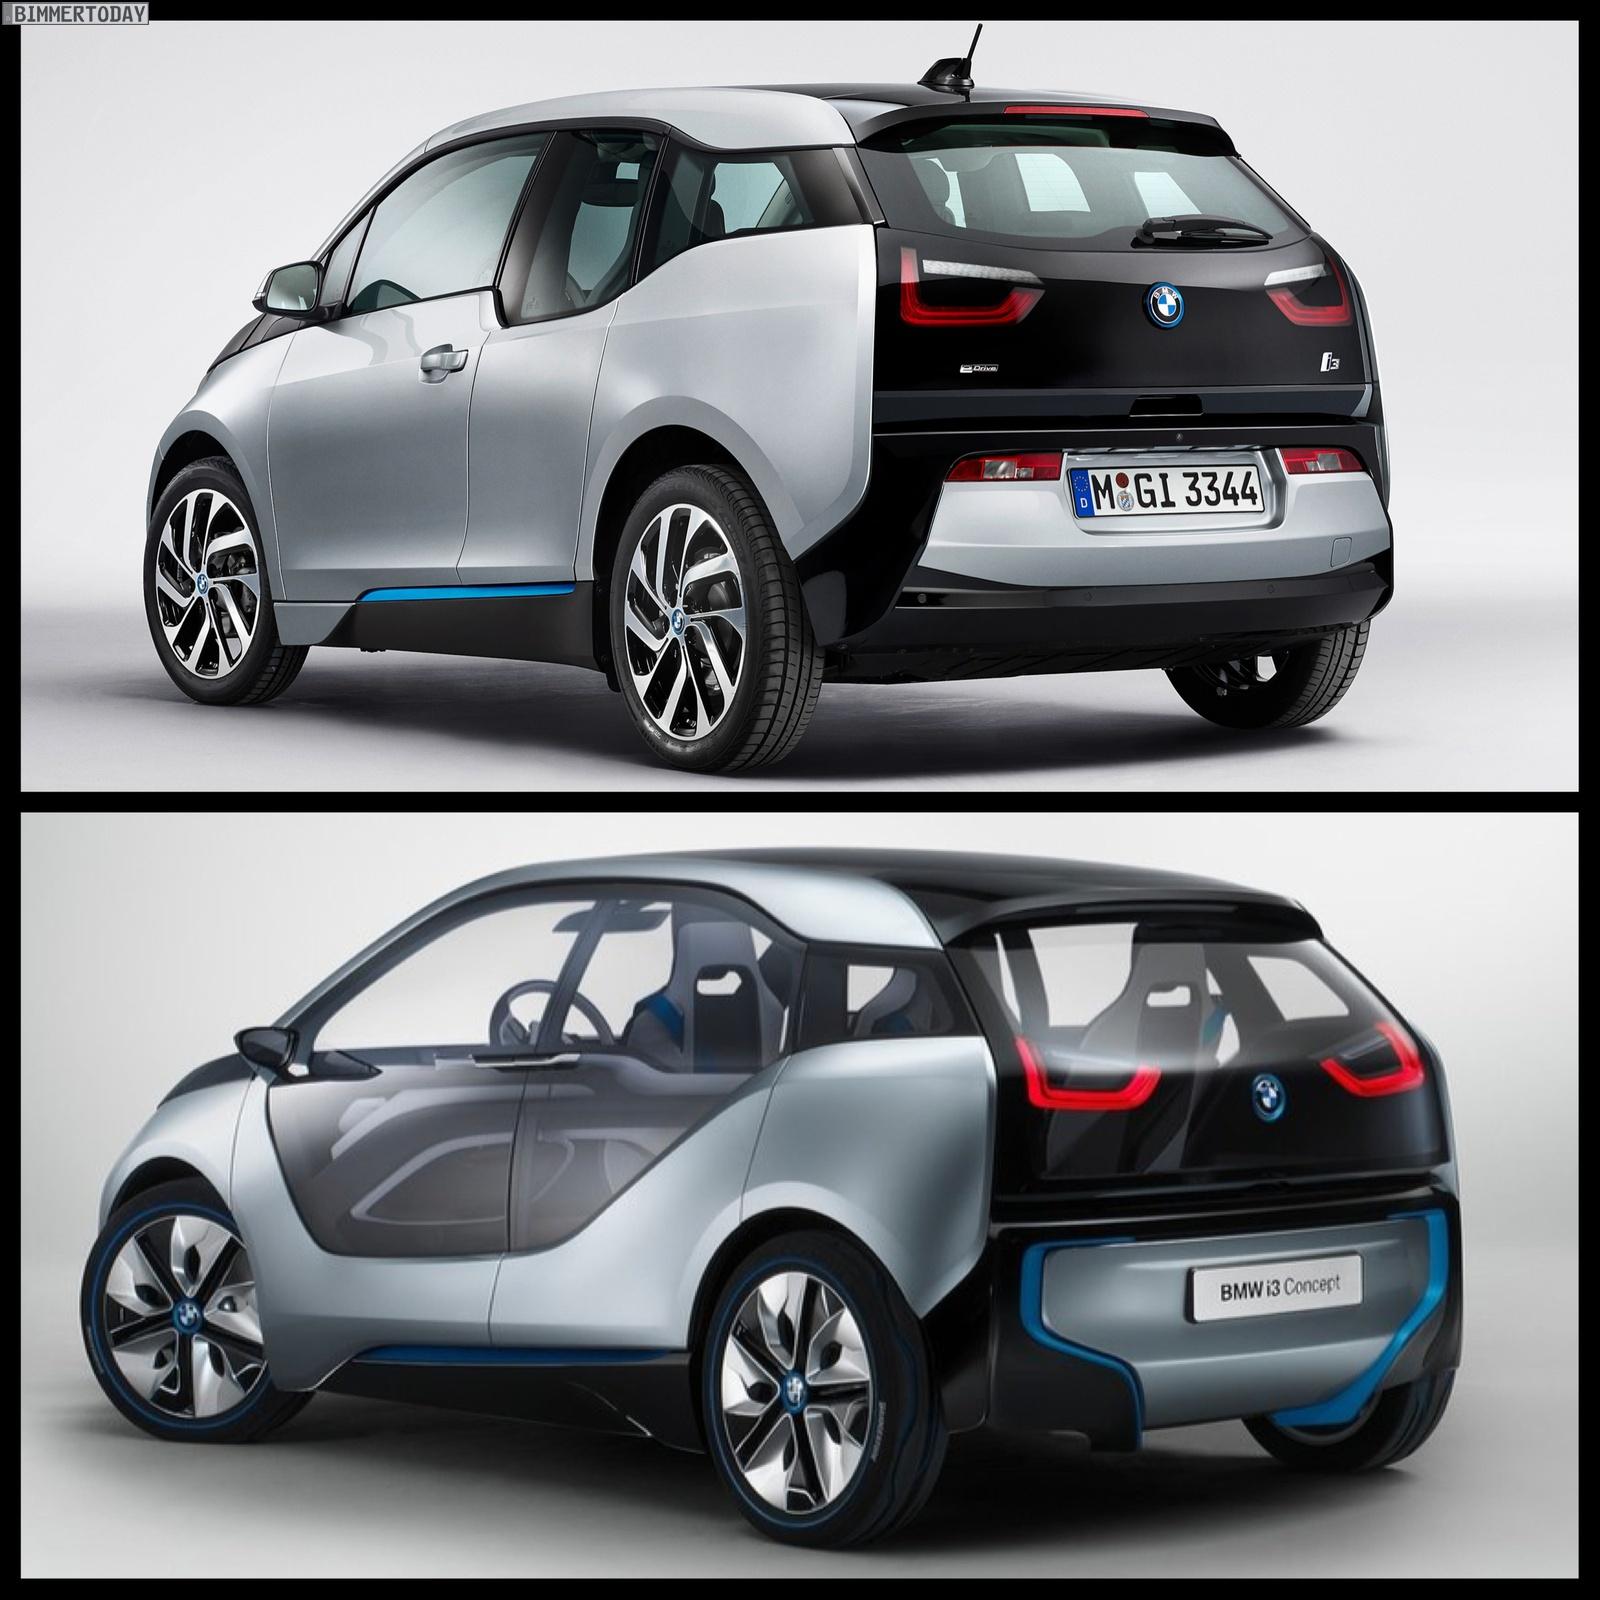 Comparison: BMW I3 Concept Vs BMW I3 Production Car